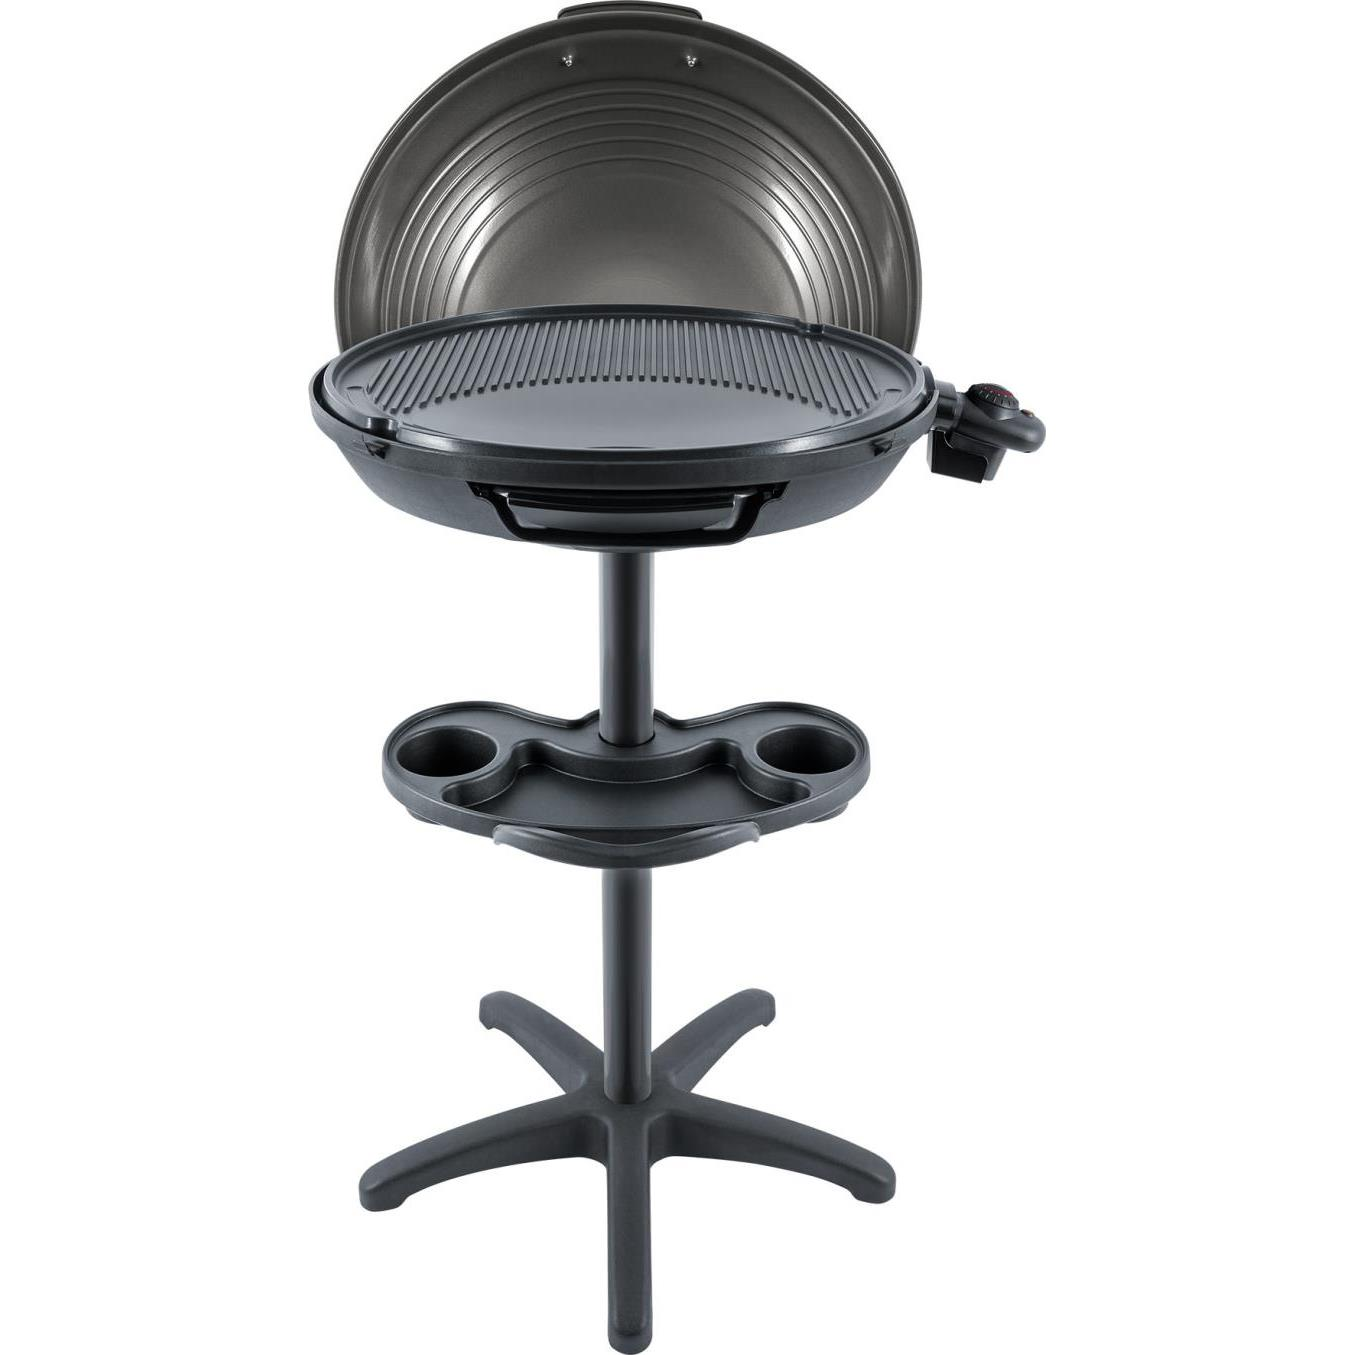 FonQ-Steba VG325 - Elektrische Barbecue - Op statief - 48 cm - Zwart-aanbieding